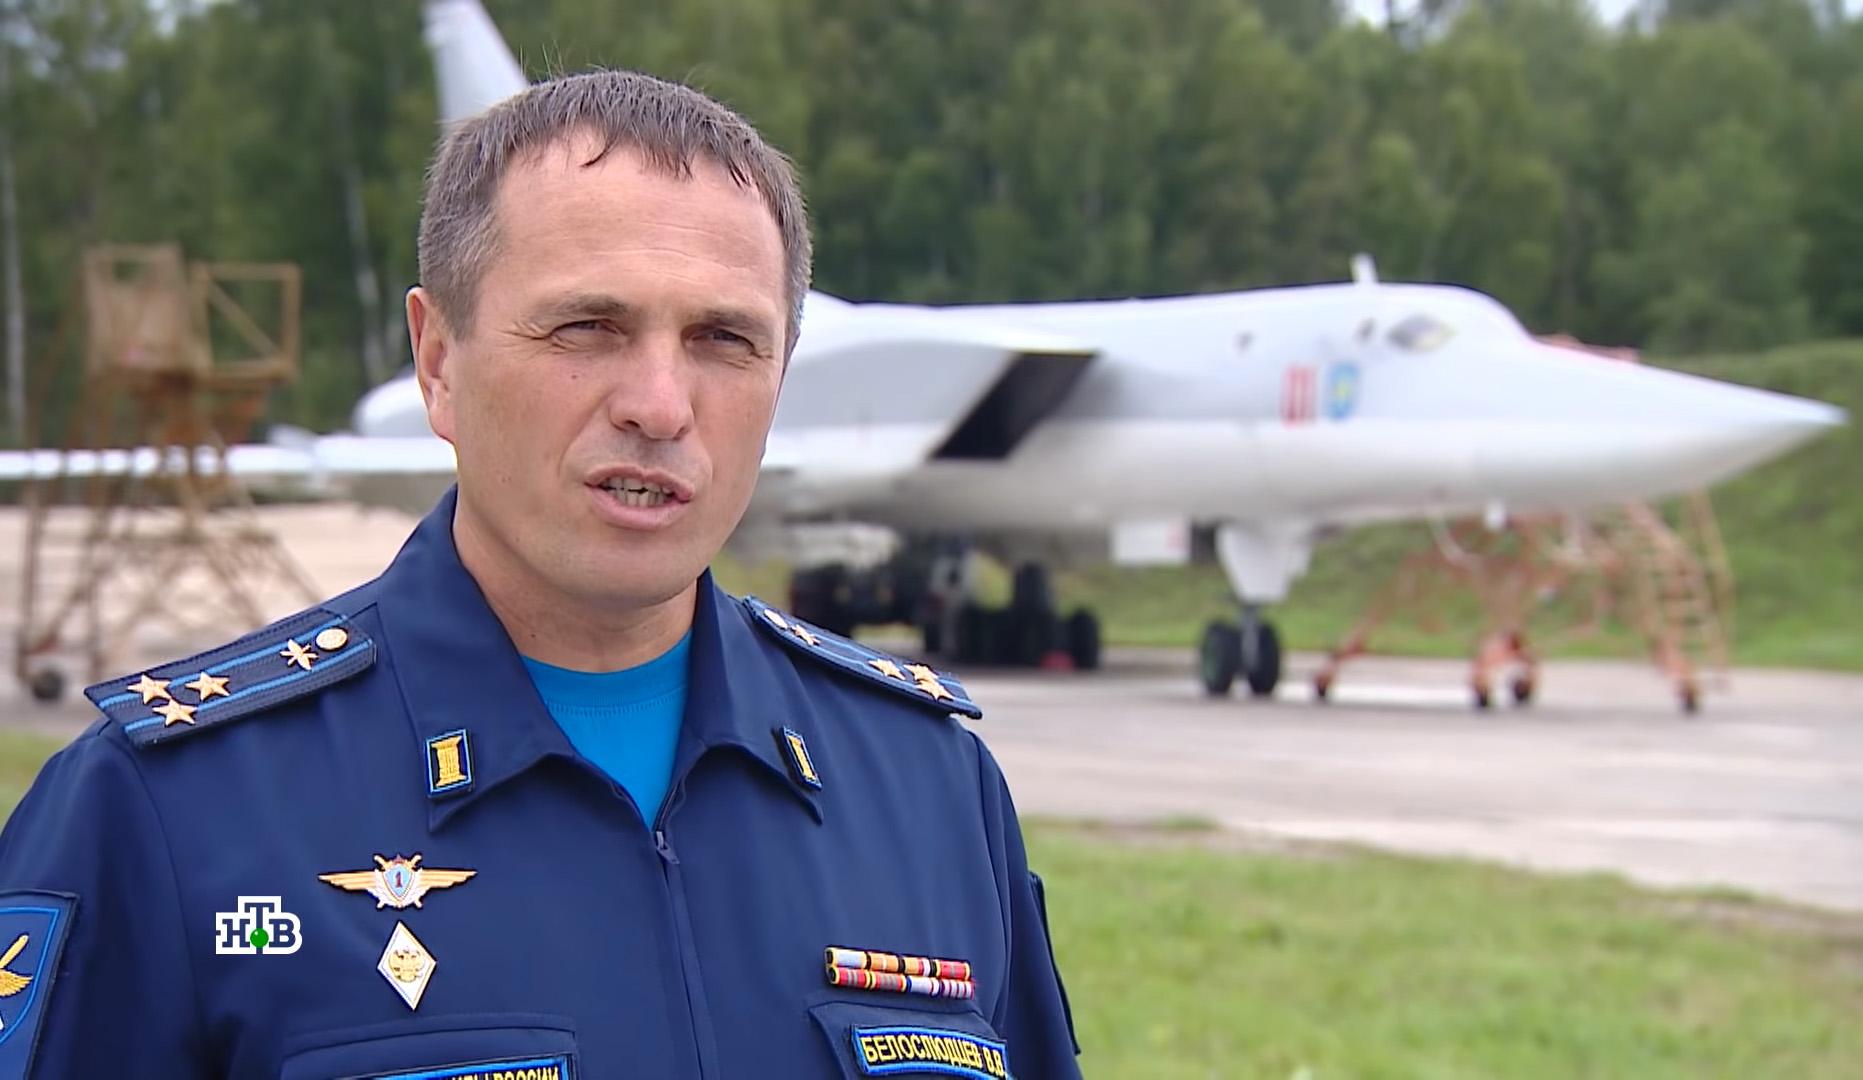 Olağandışı bir Tu-22M3 olayı